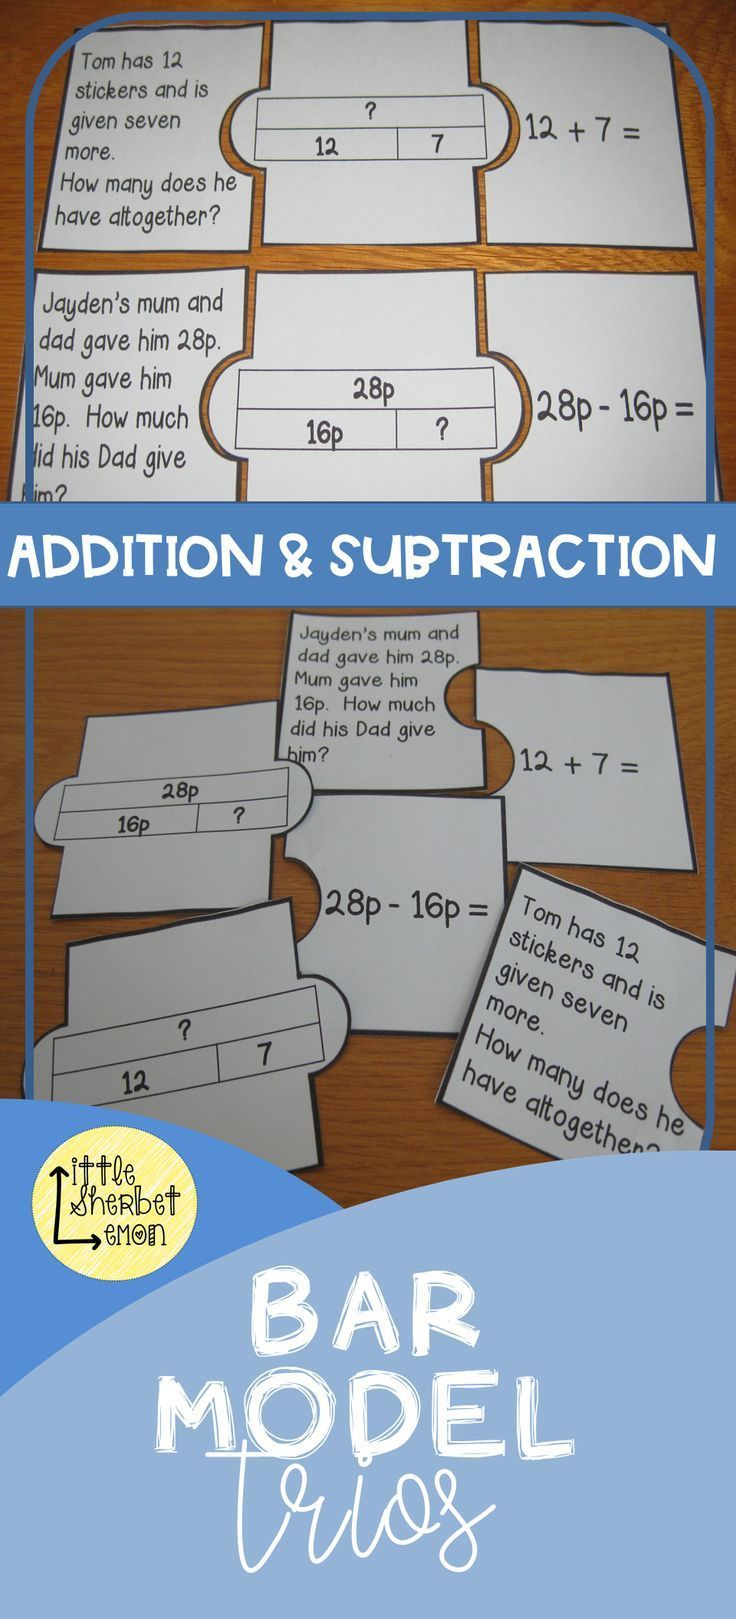 Addition And Subtraction Bar Model Trios Grade 1 2 Addition And Subtraction Bar Model First Grade Lessons Addition and subtraction bar model